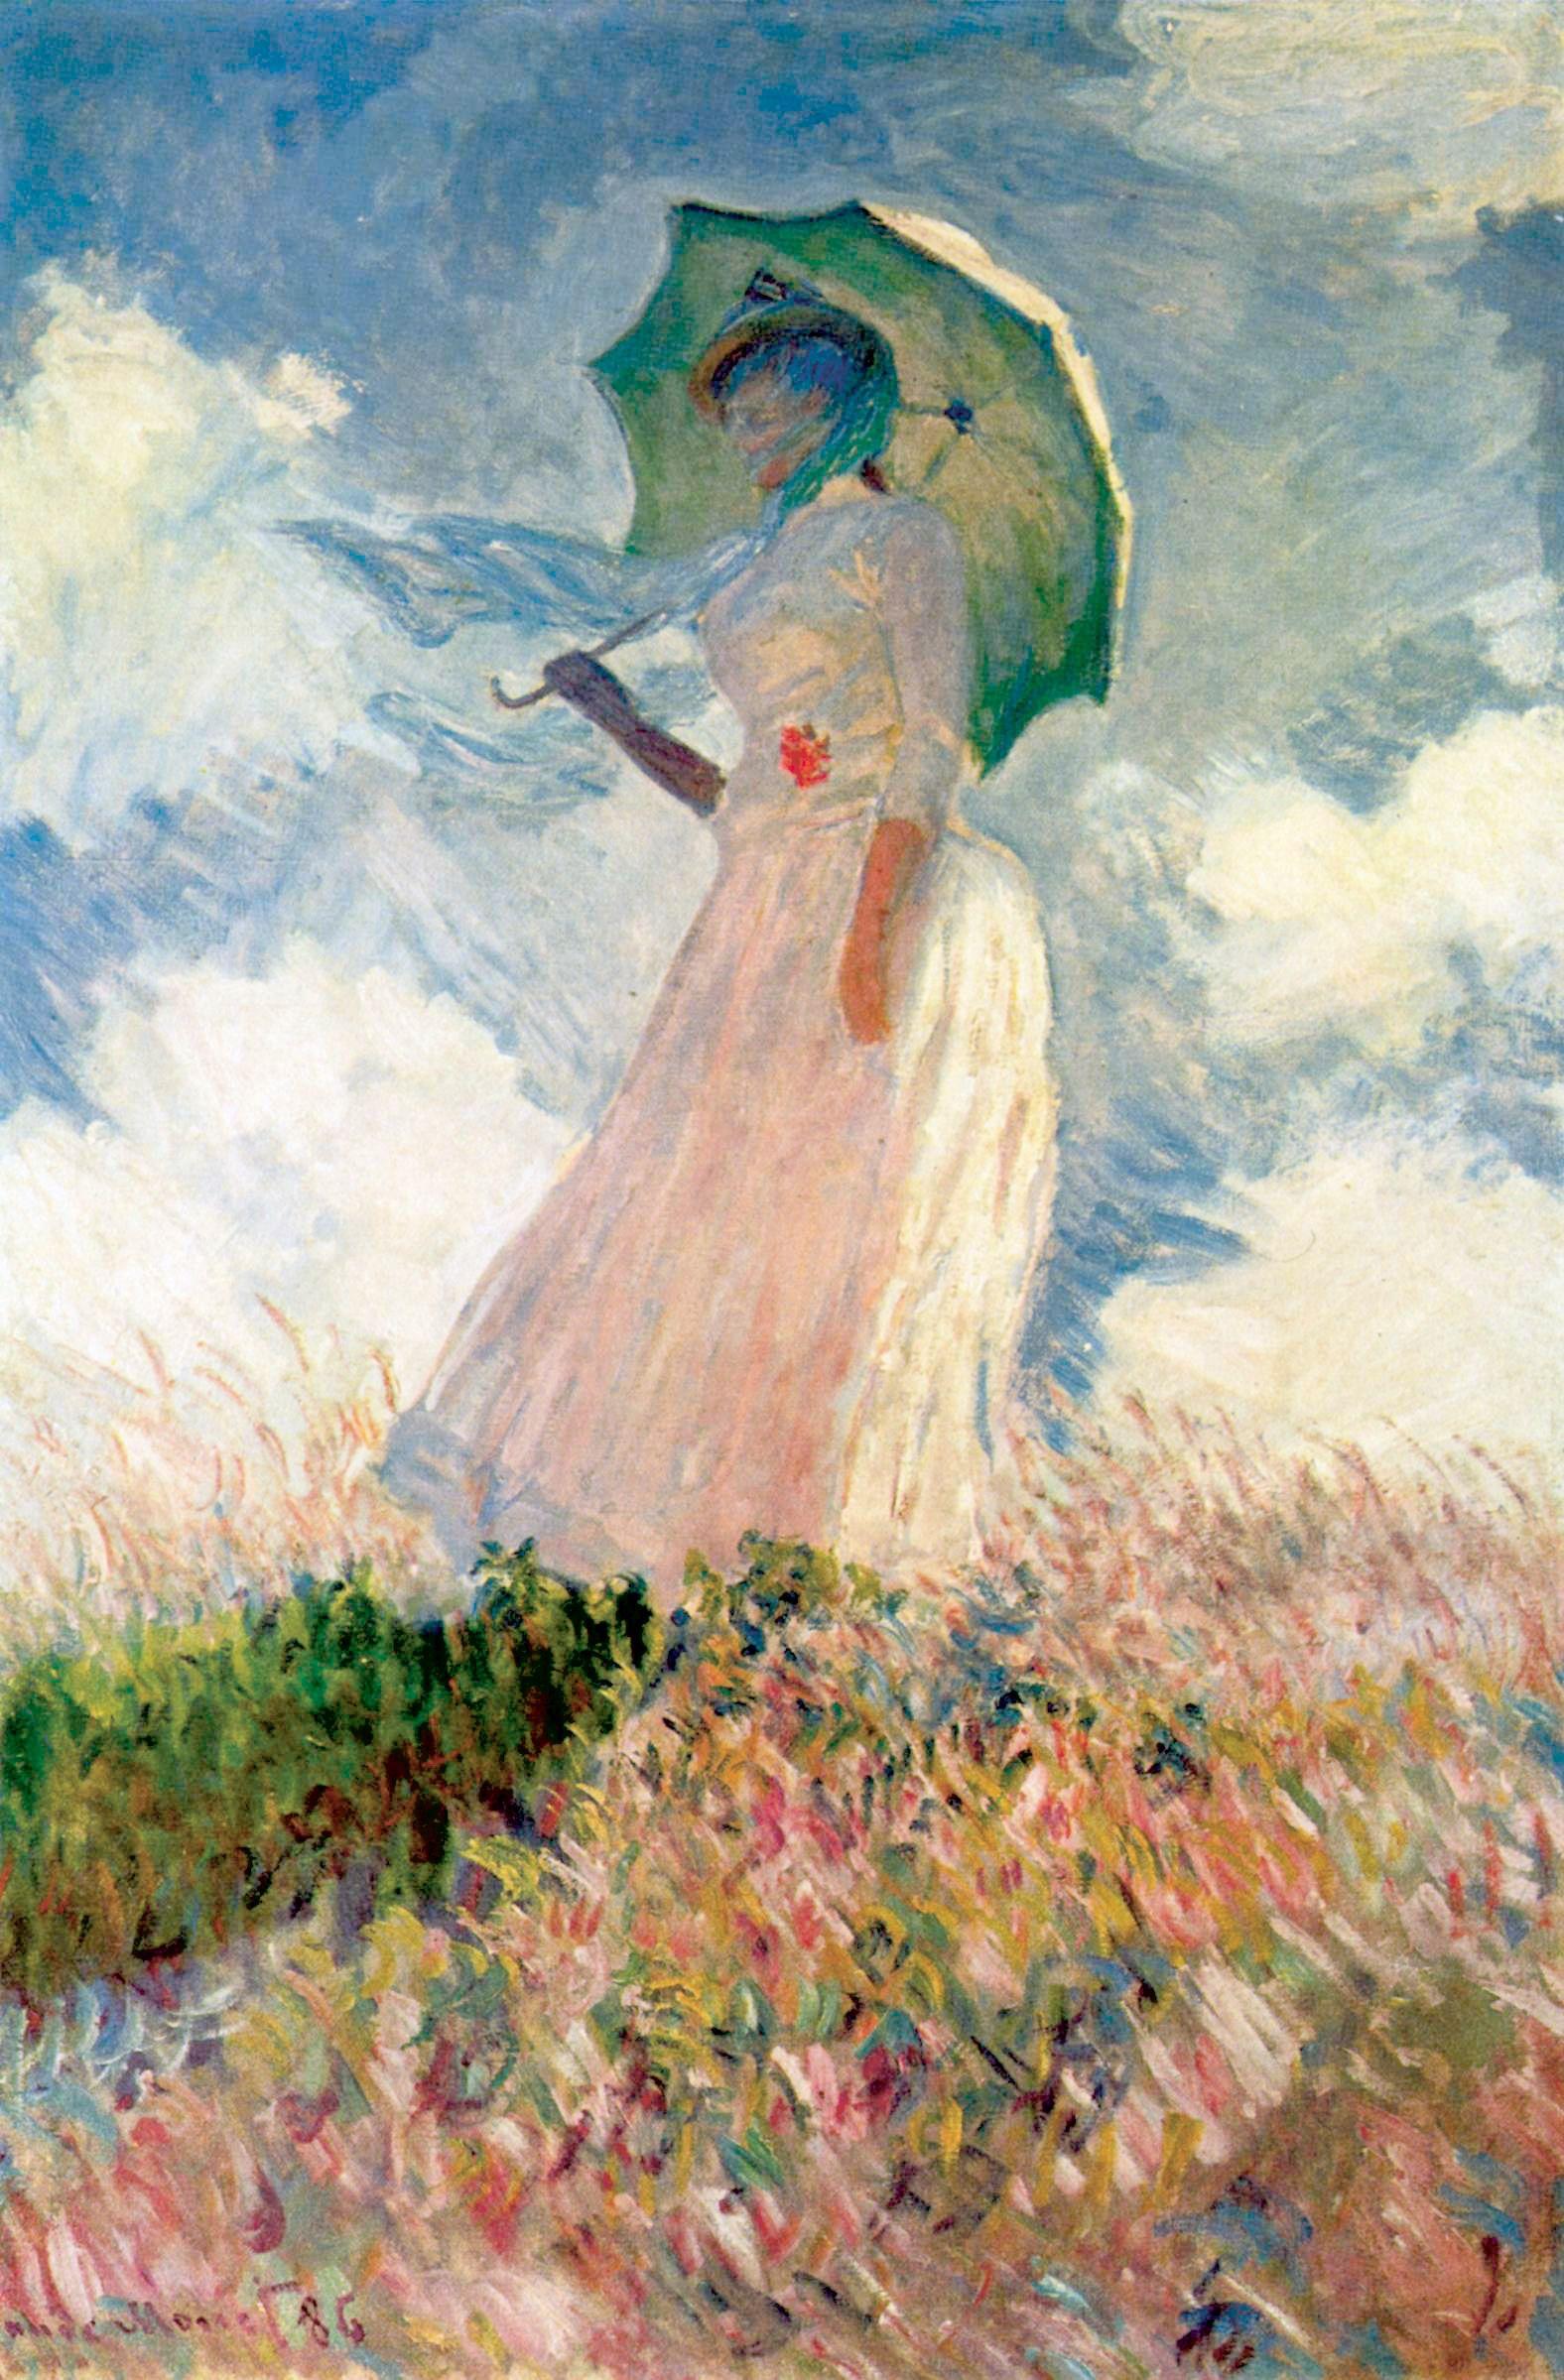 Claude Monet ~ The Lady with the Umbrella | Artist monet, Claude ...